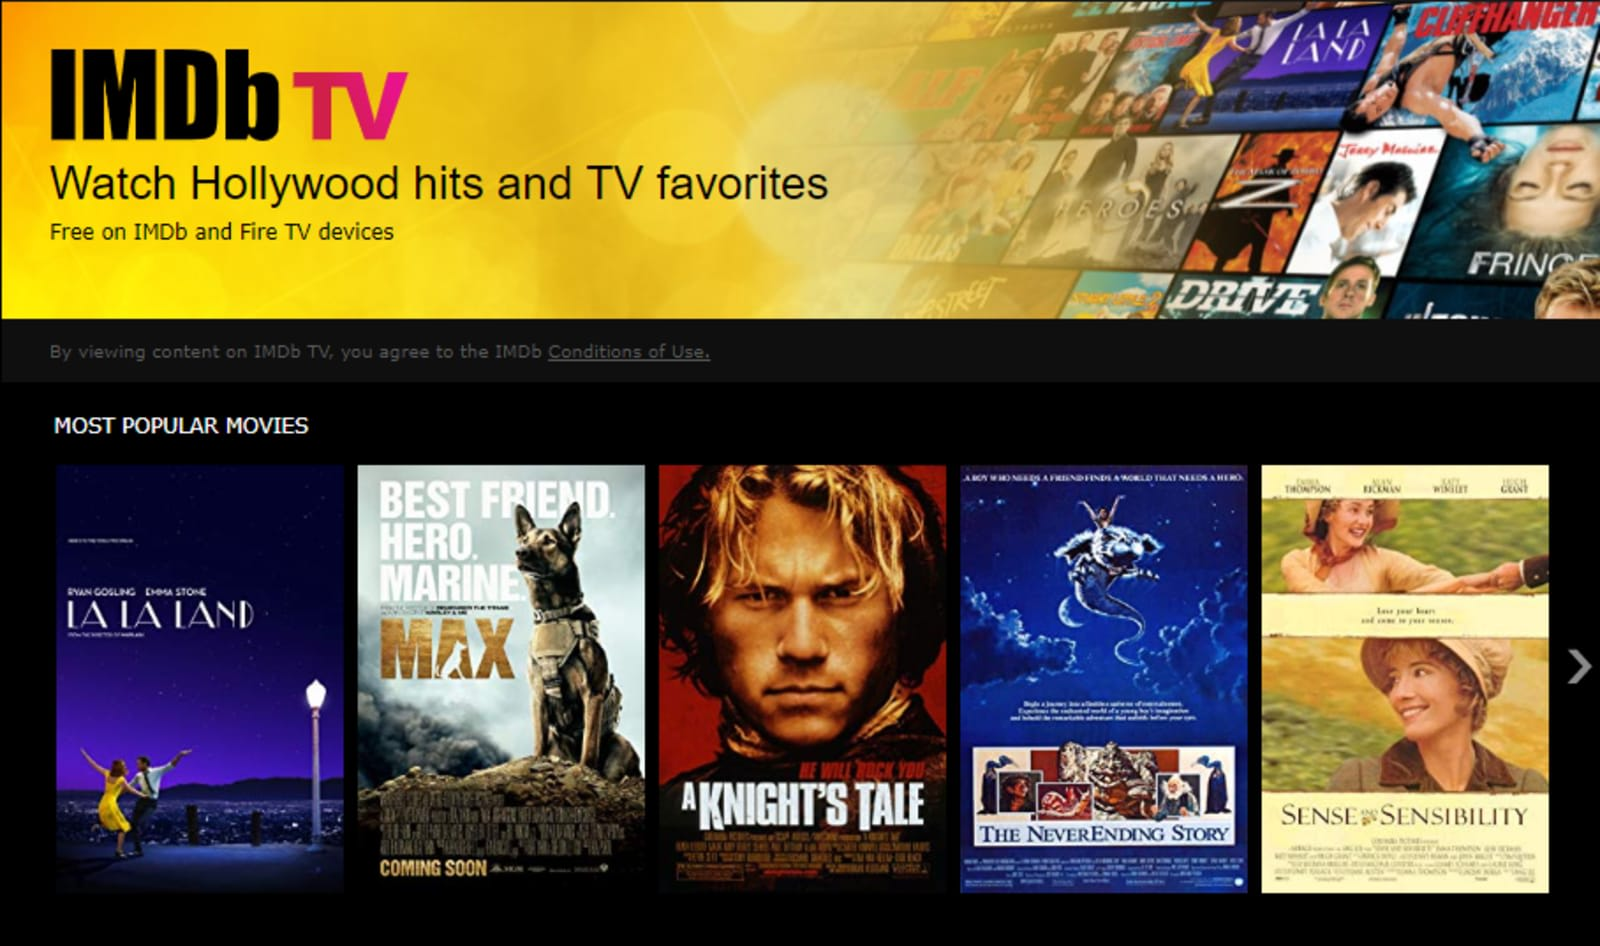 Watch dozens of free movies in IMDb's app